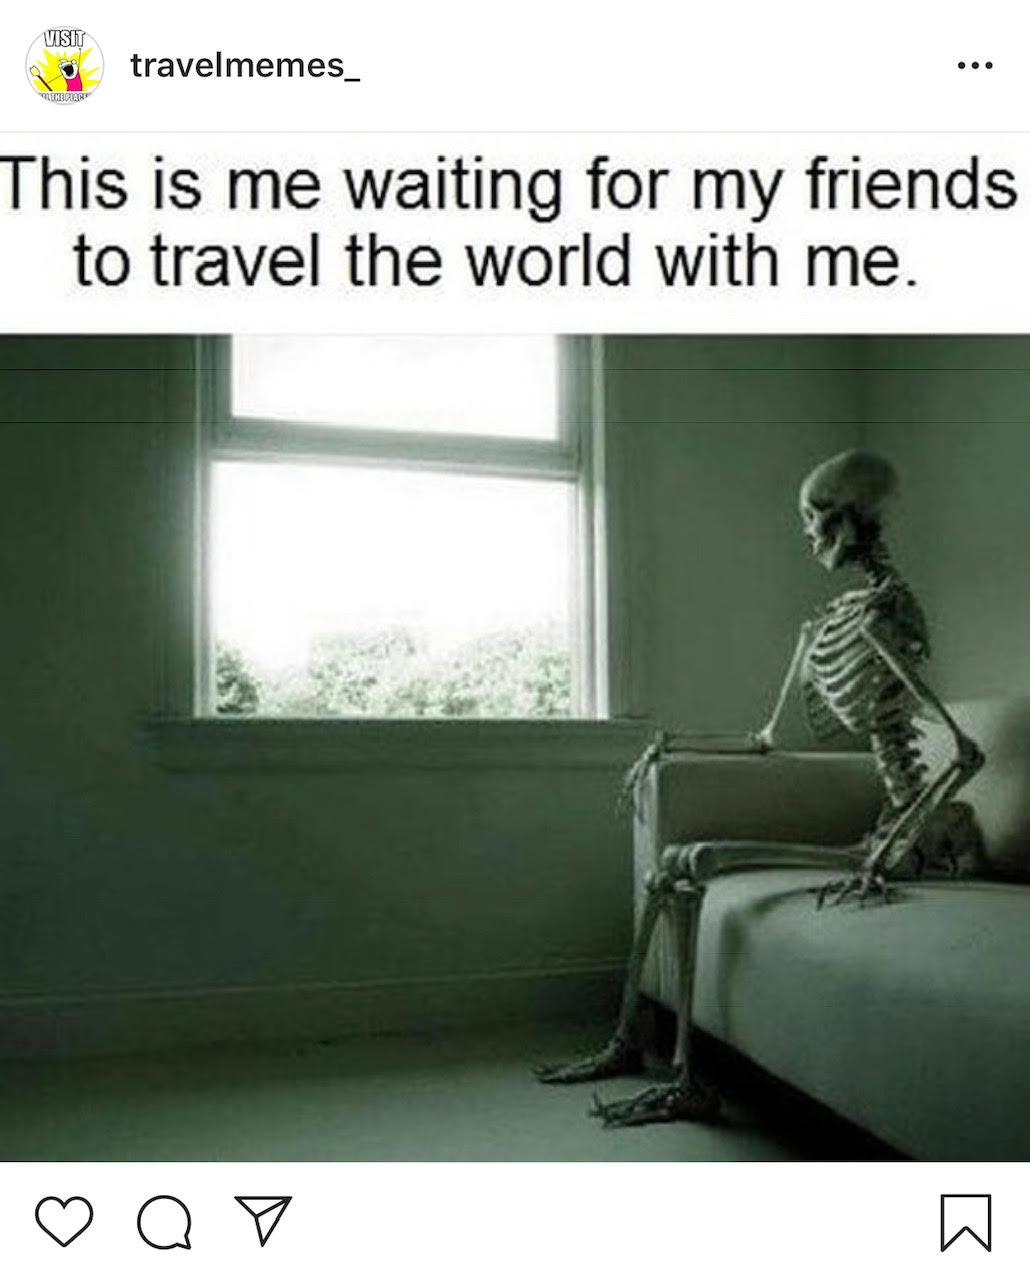 20 Funny Travel Memes You Gotta See! \u2013 2girlswhotravel